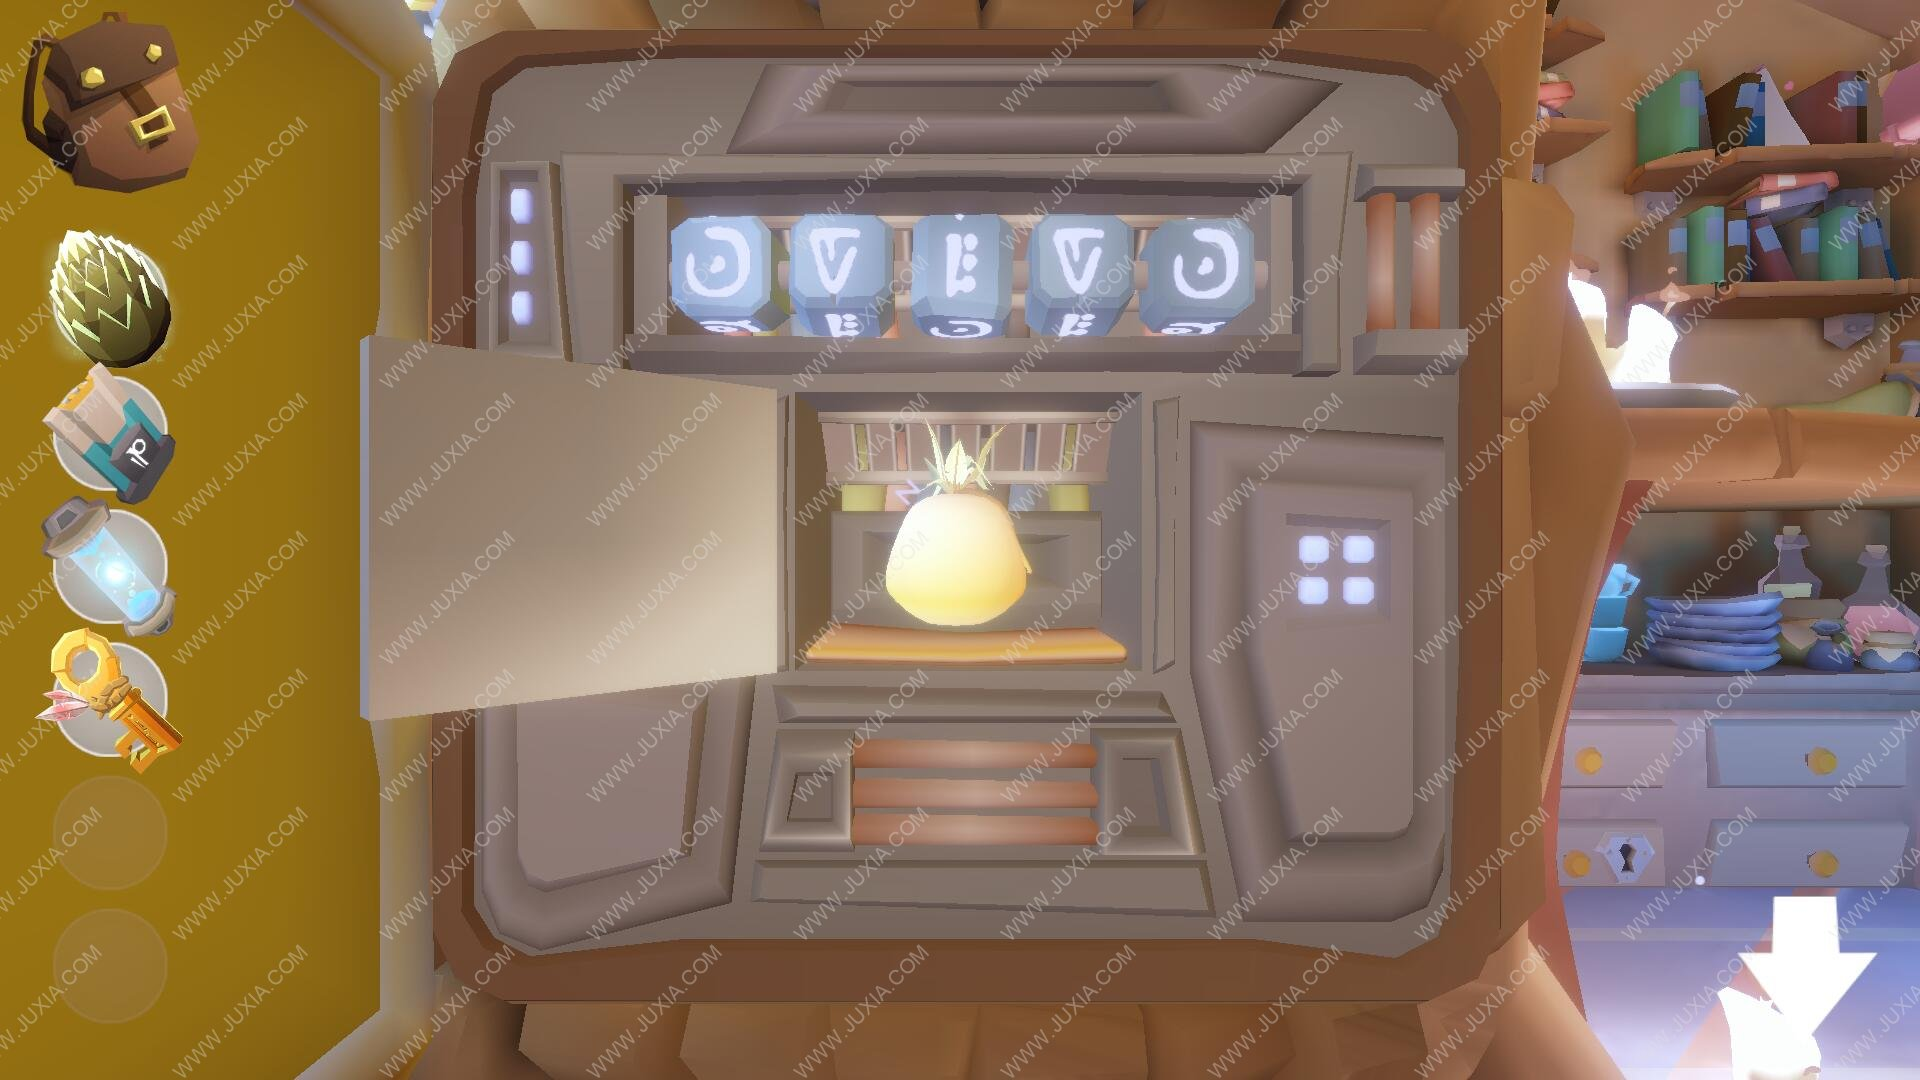 KrystopiaNovasJourney攻略第二章下 氪星新星之旅柜子怎么打开